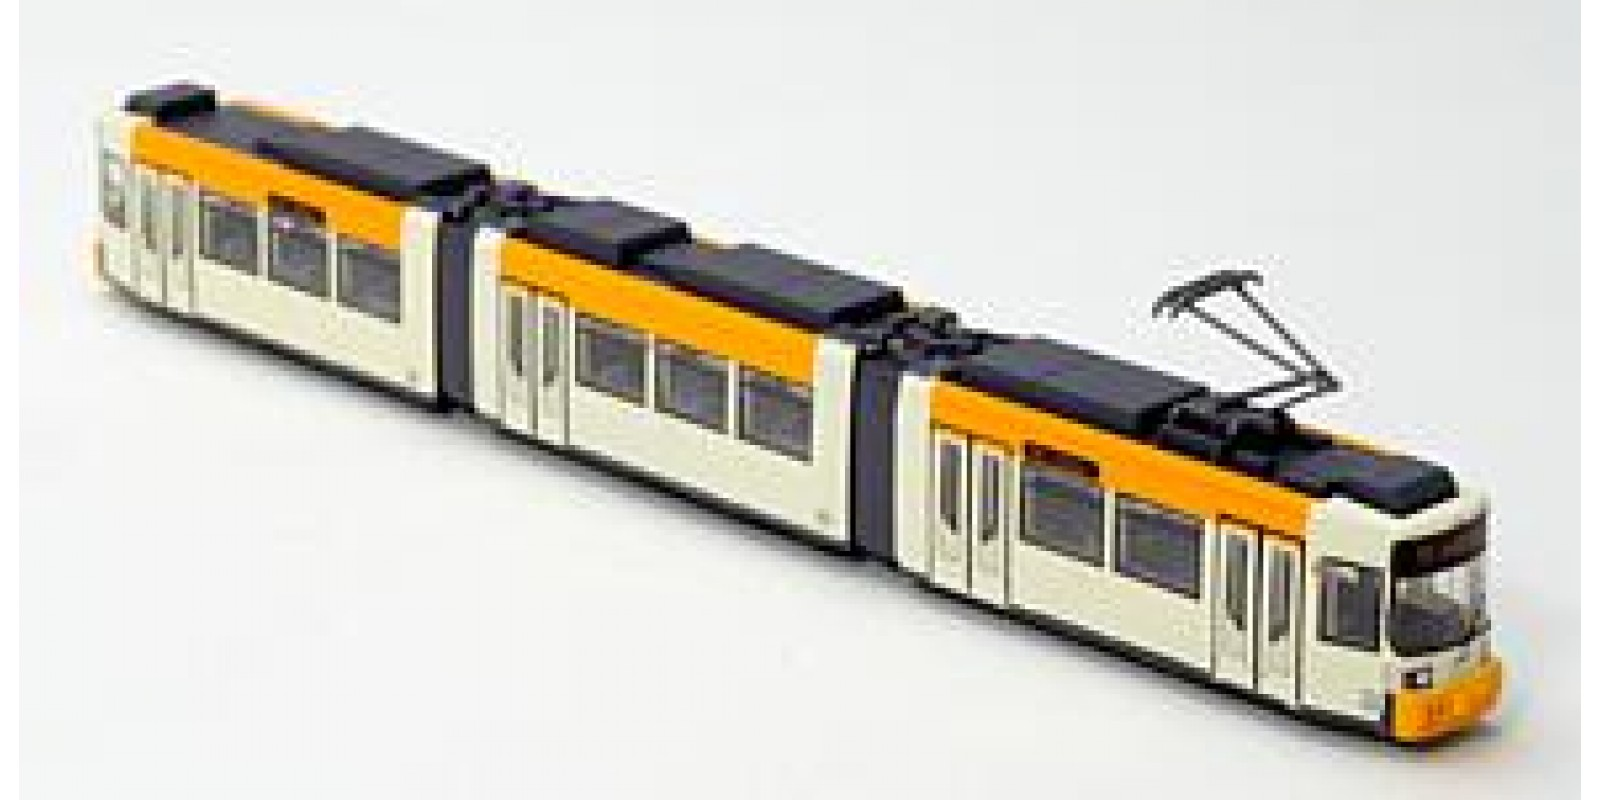 FA971589 Tram system, Mainz tram, type 200